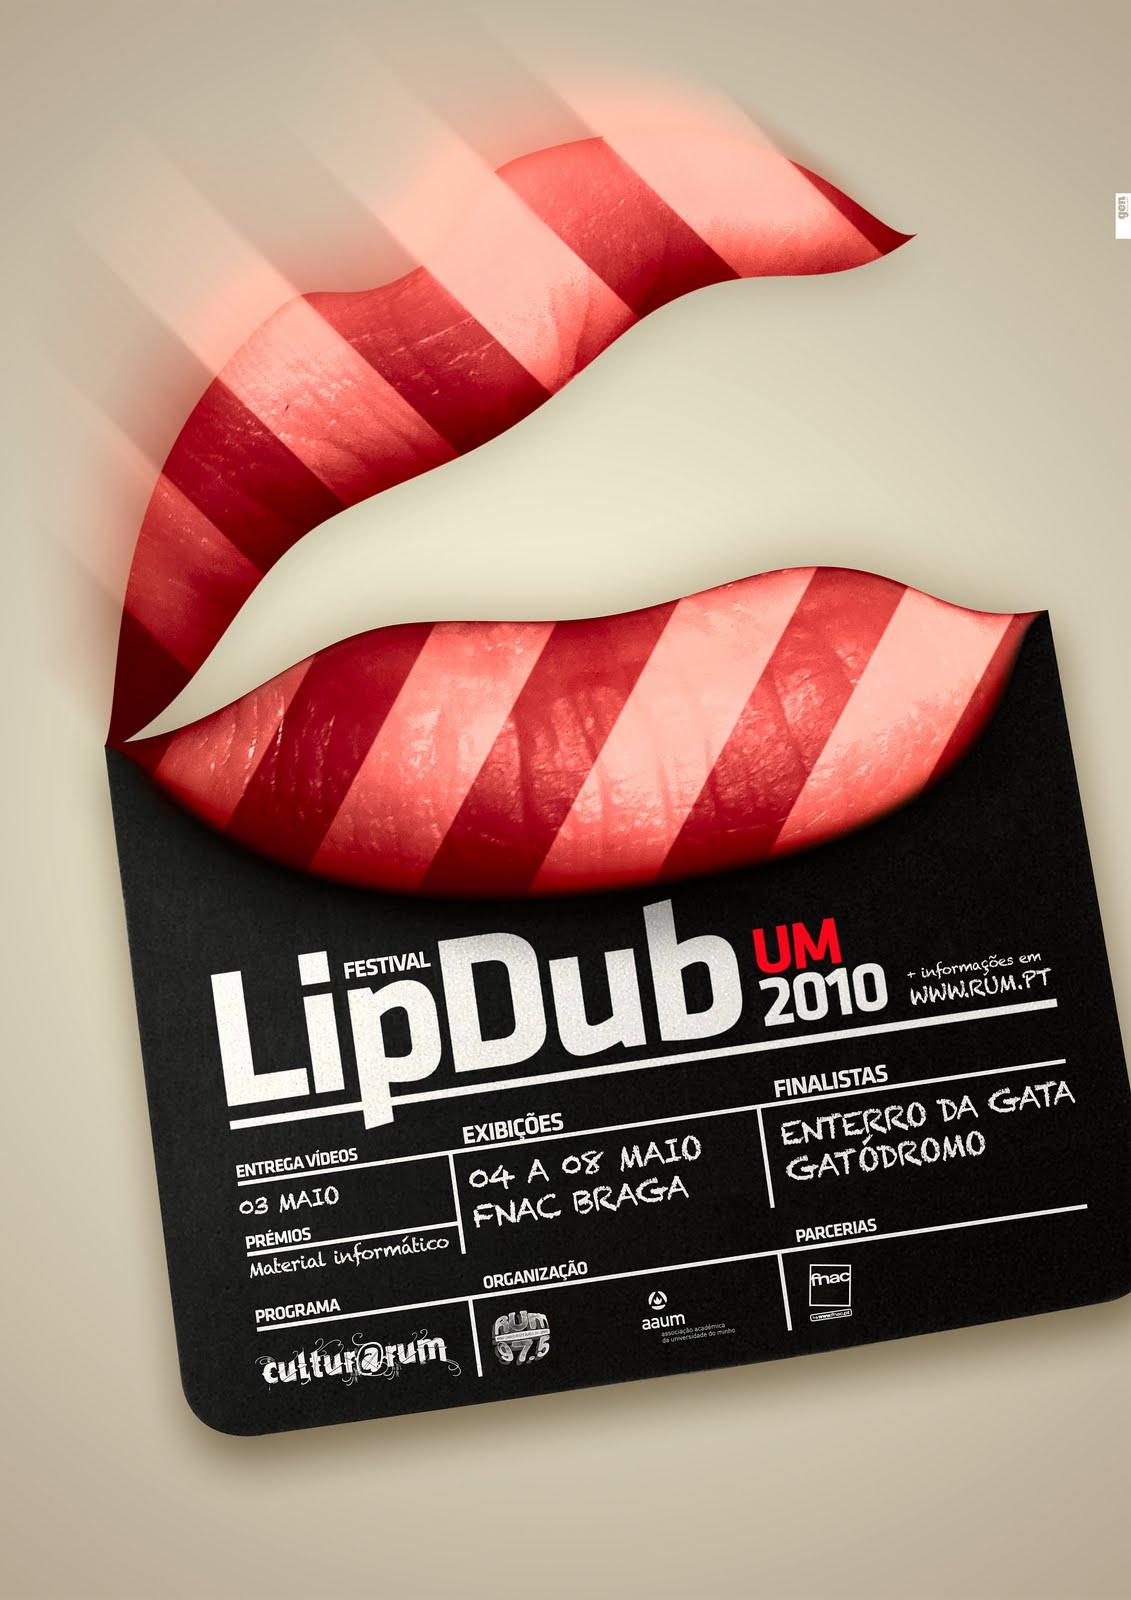 Lip-Dub-Festival-UMinho-2010-Gen-Desing-Studio-lips-clapperboard